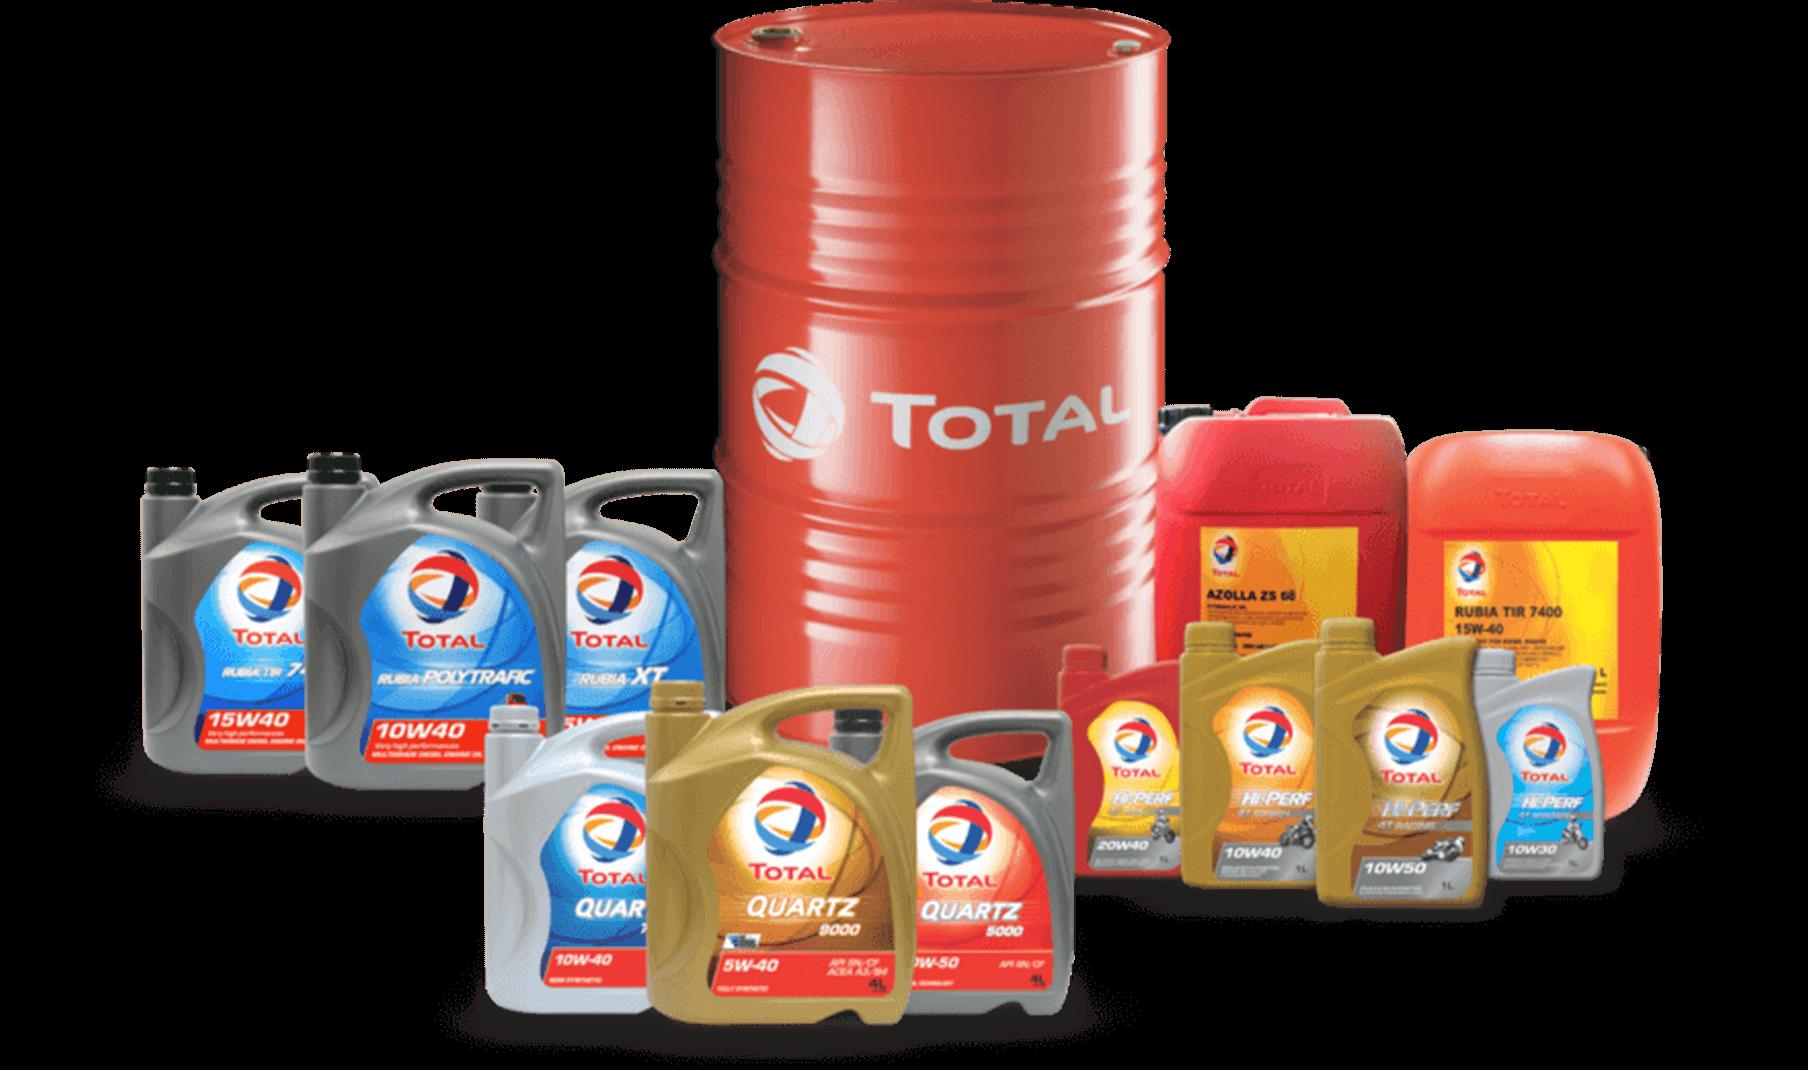 محصولات توتال